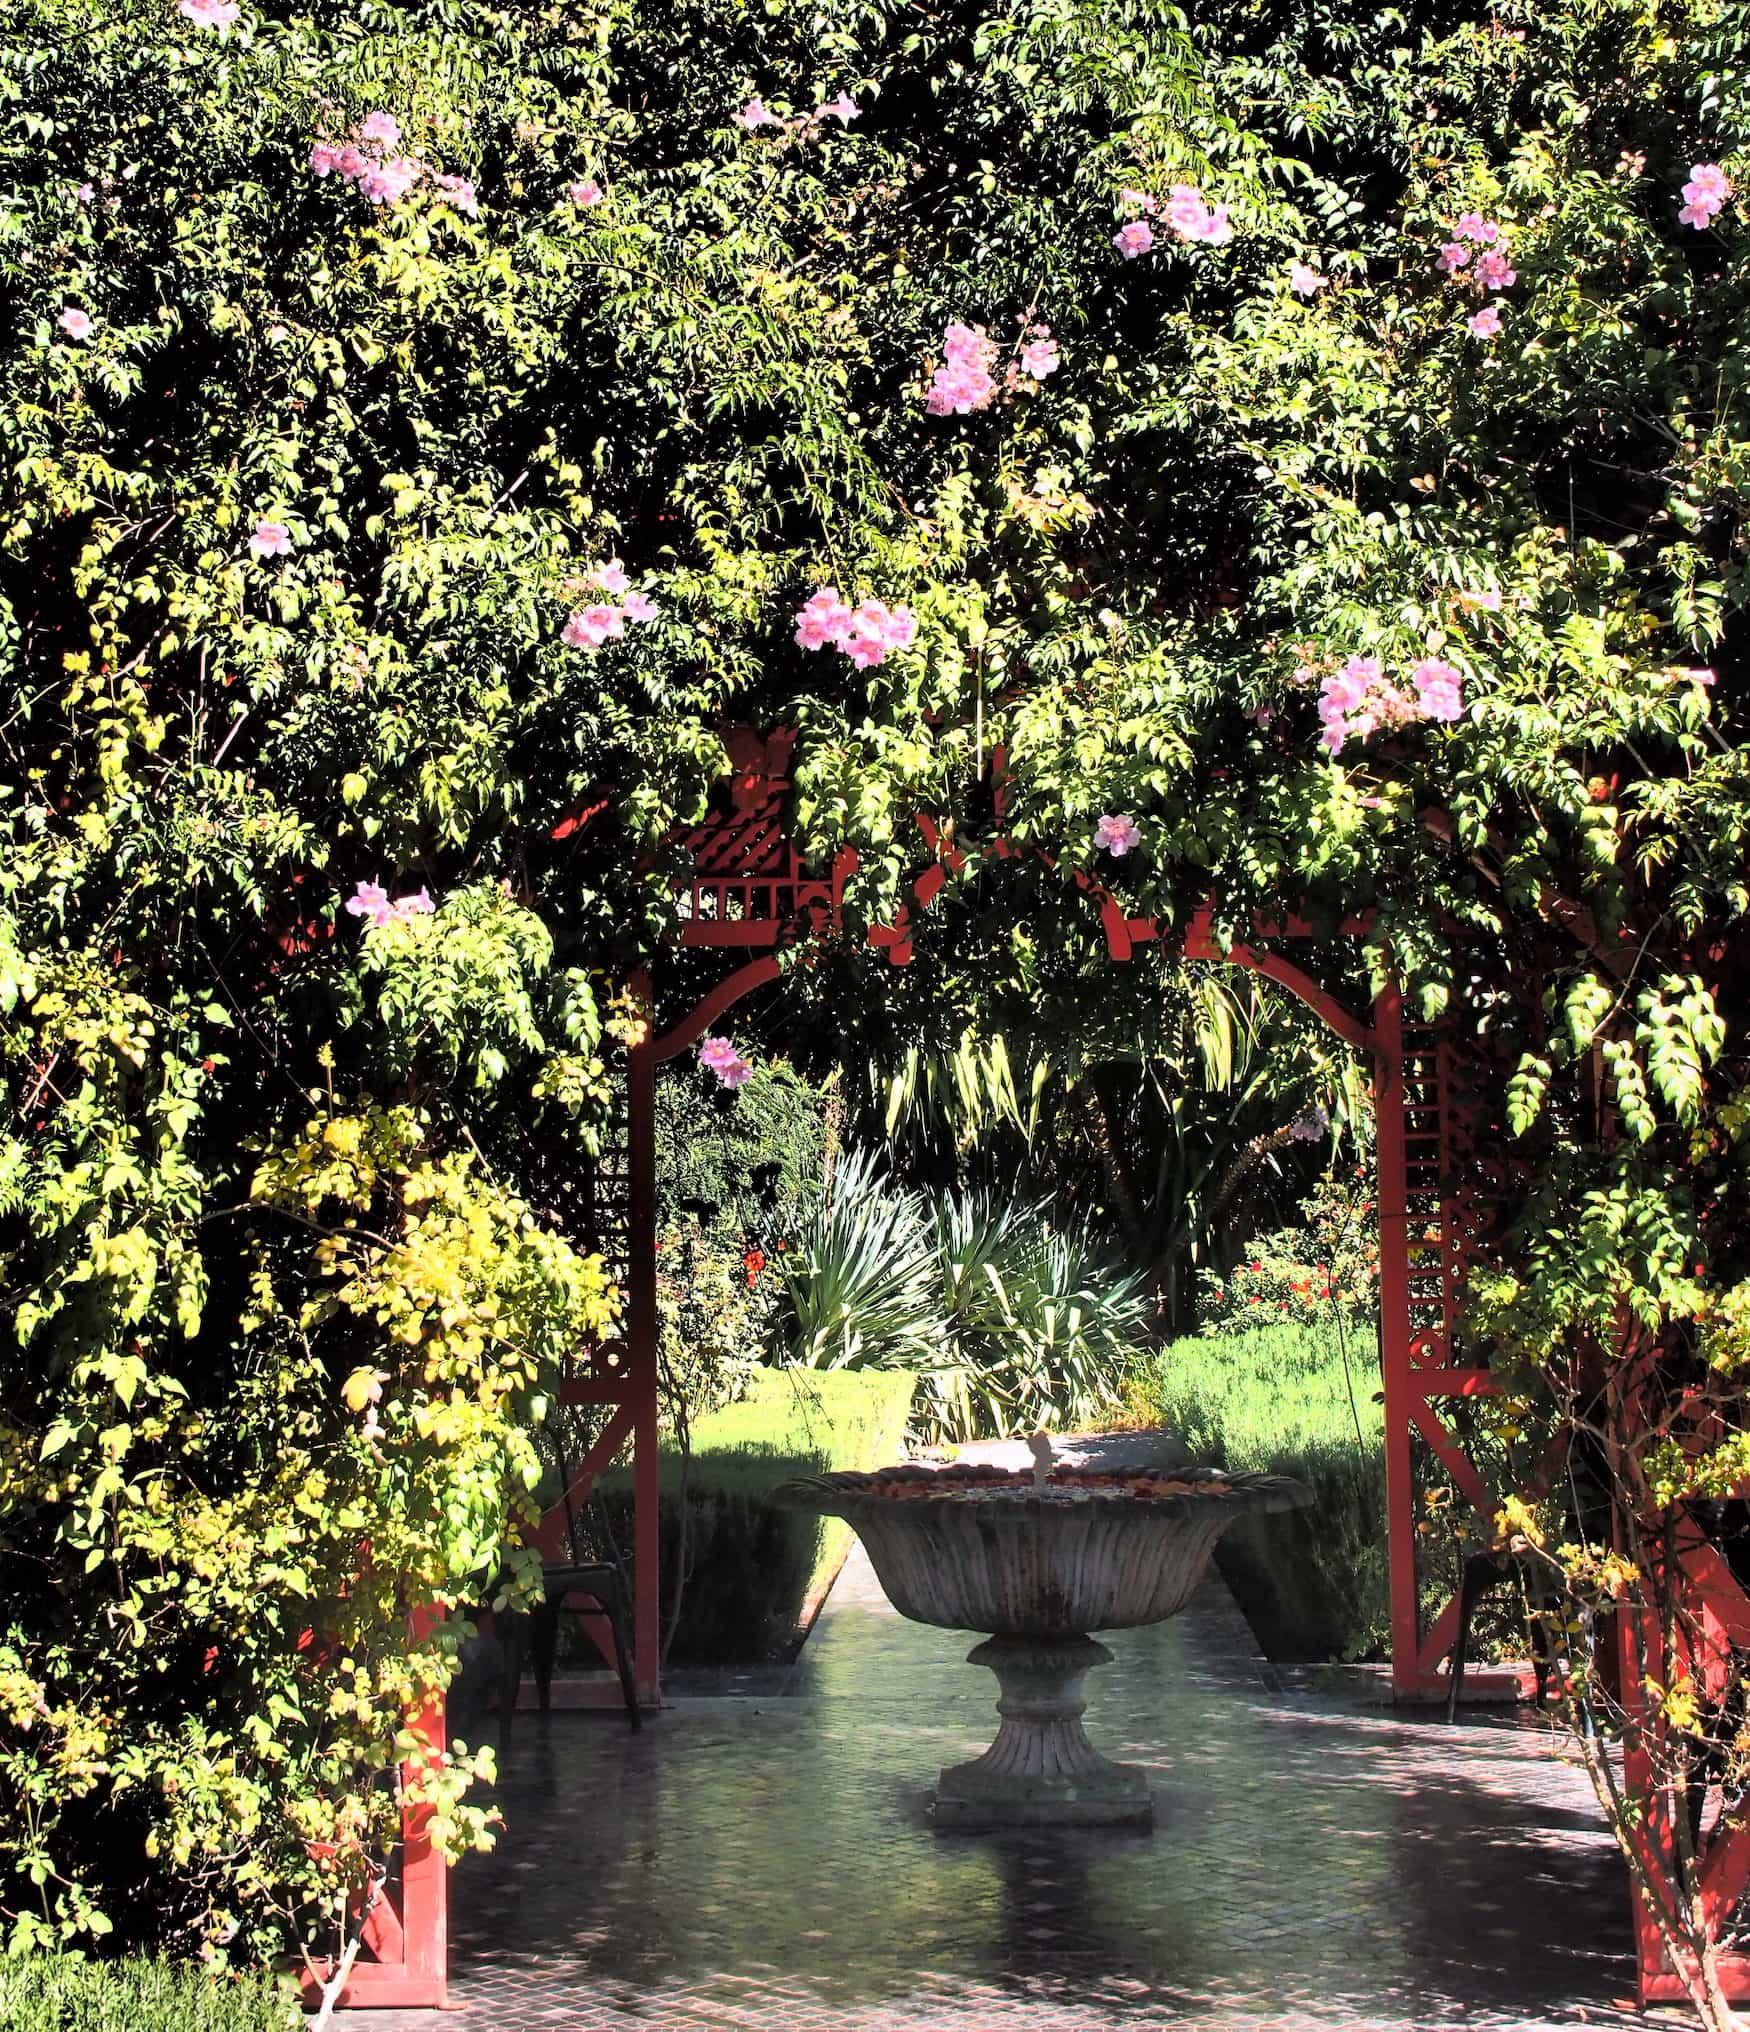 Garten von Andre Heller Anima - Marrakesch -Kreative